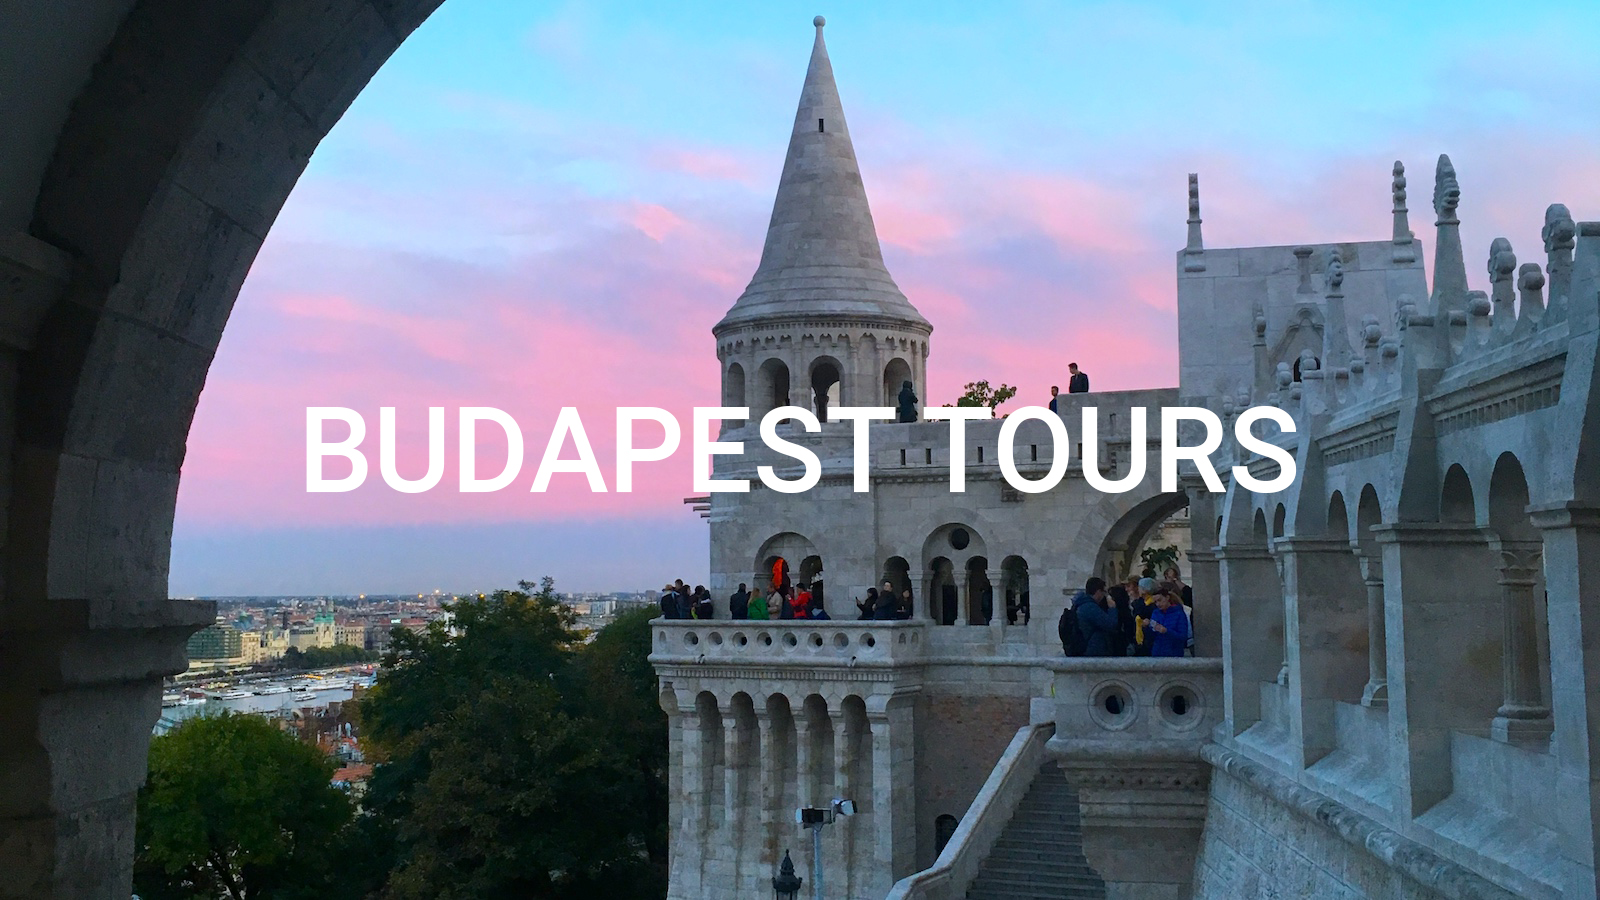 Budapest Tours